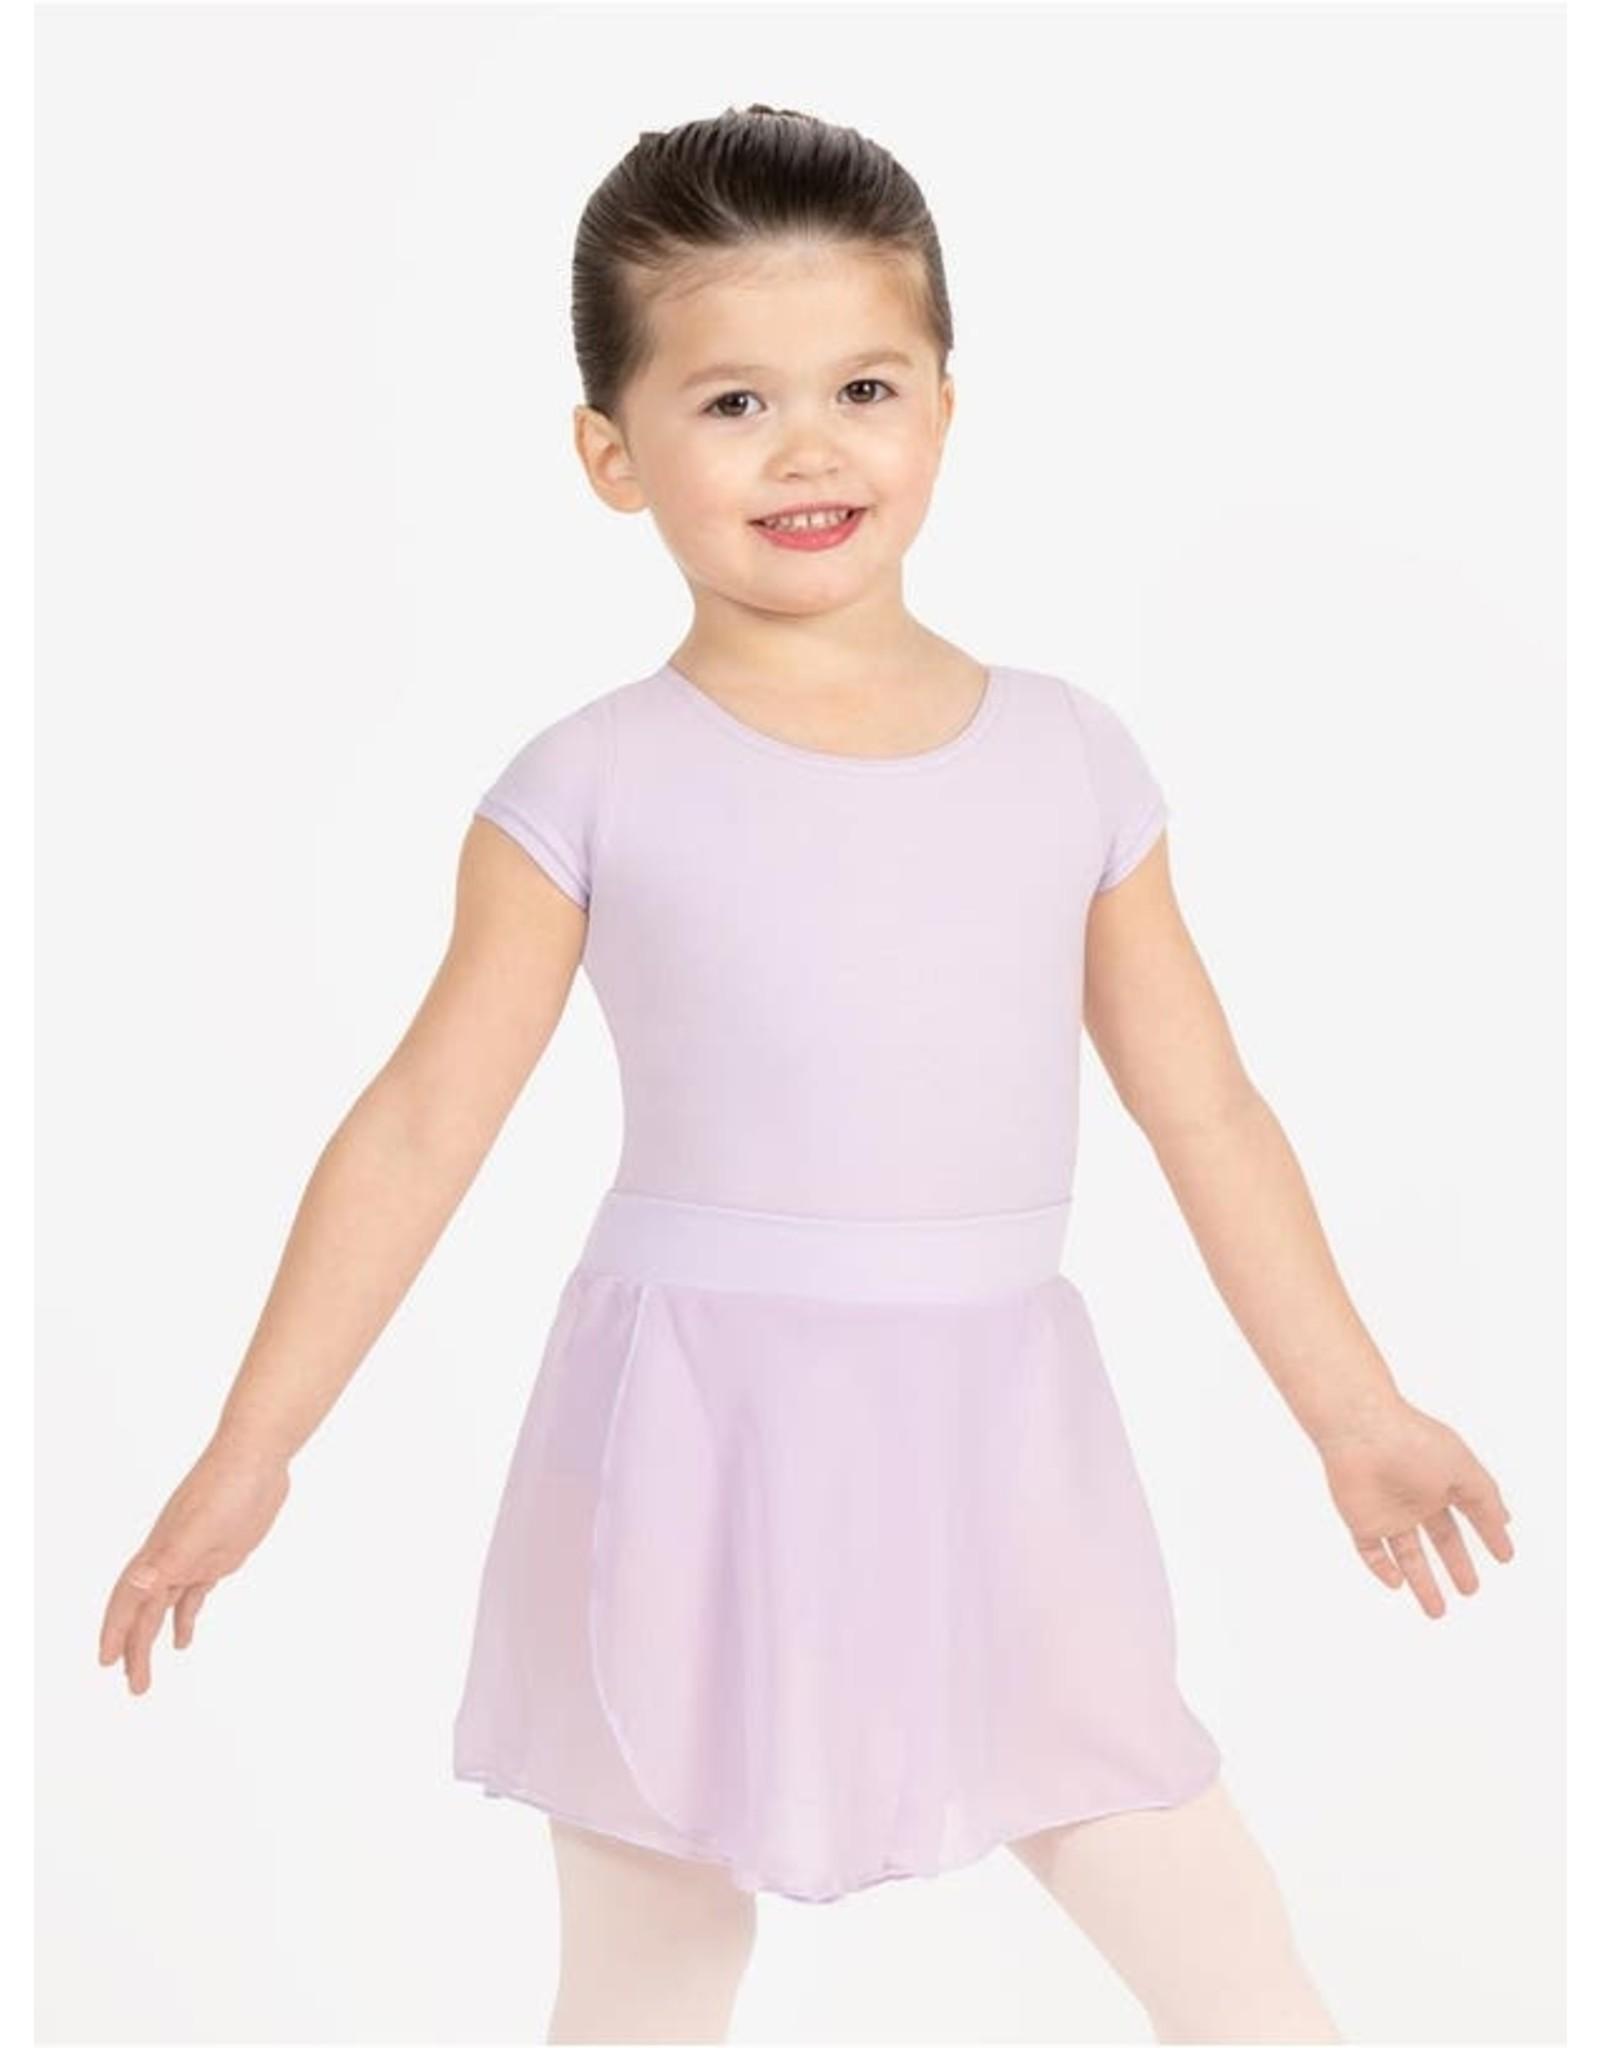 Capezio Studio Collection Pull On Skirt - Child